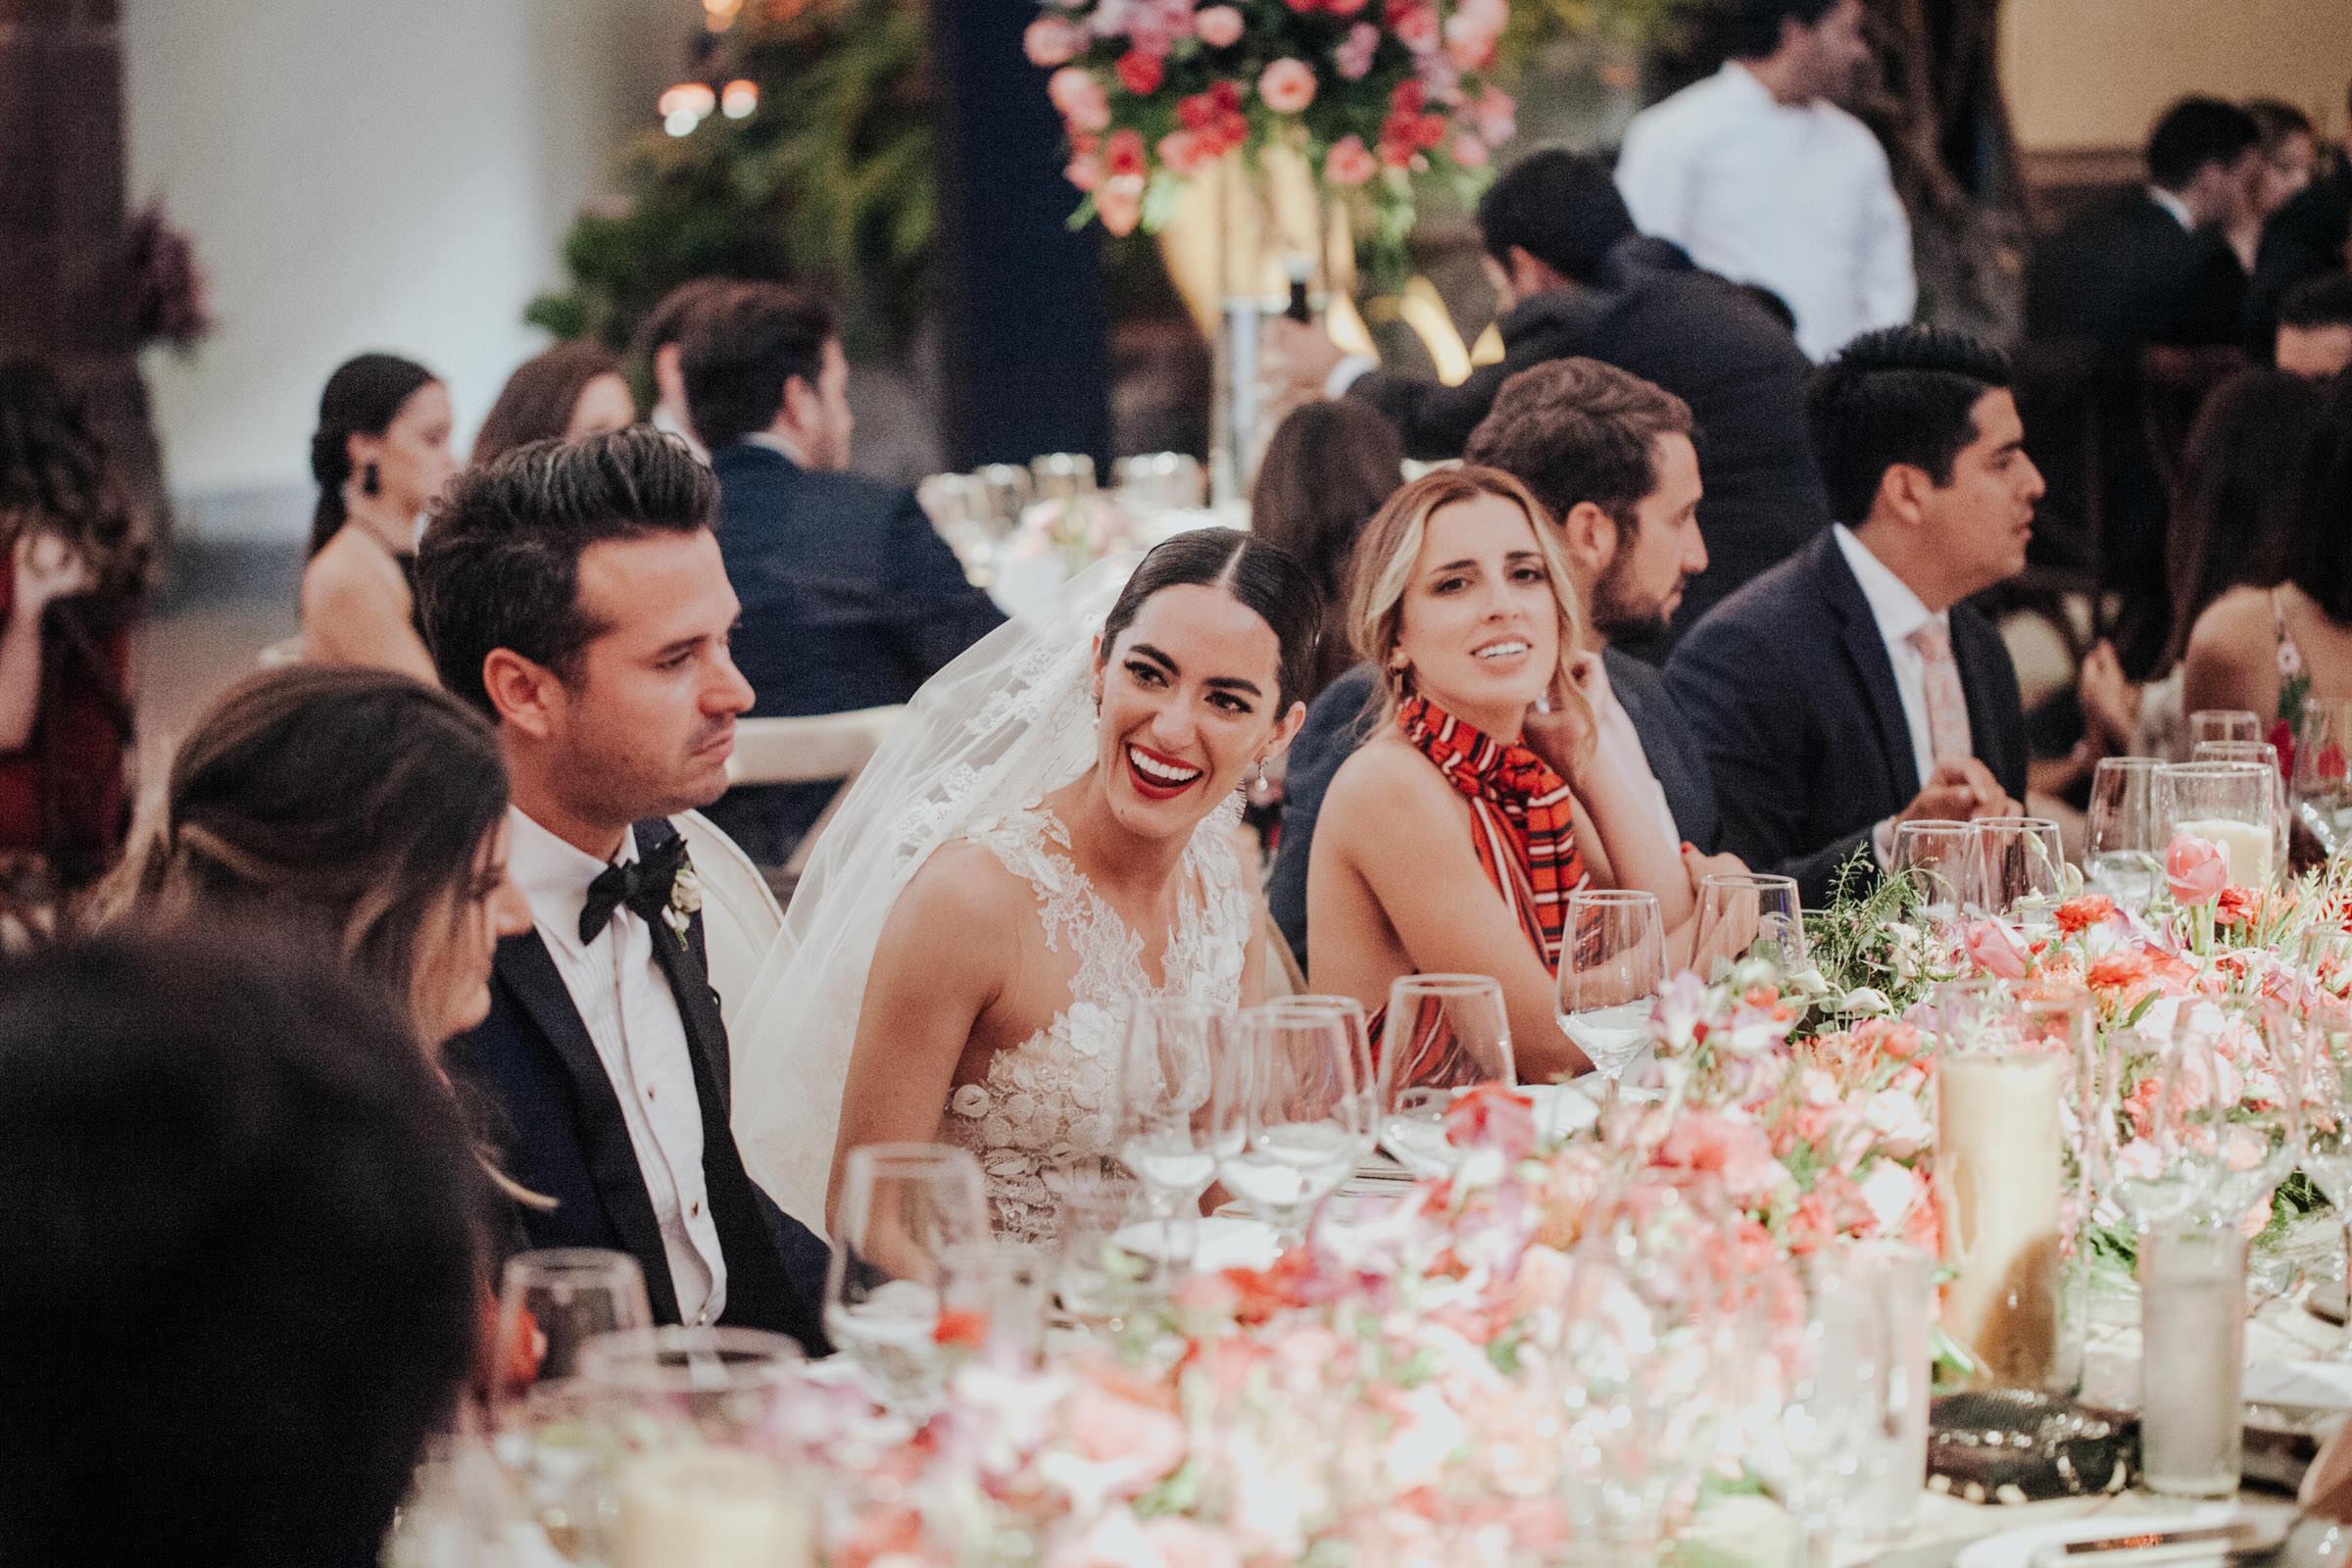 San-Miguel-de-Allende-Wedding-Photography-Parroquia-Instituto-Boda-Fotografia-Fer-Sergio-Pierce-Lifestyle-Photography0011.JPG